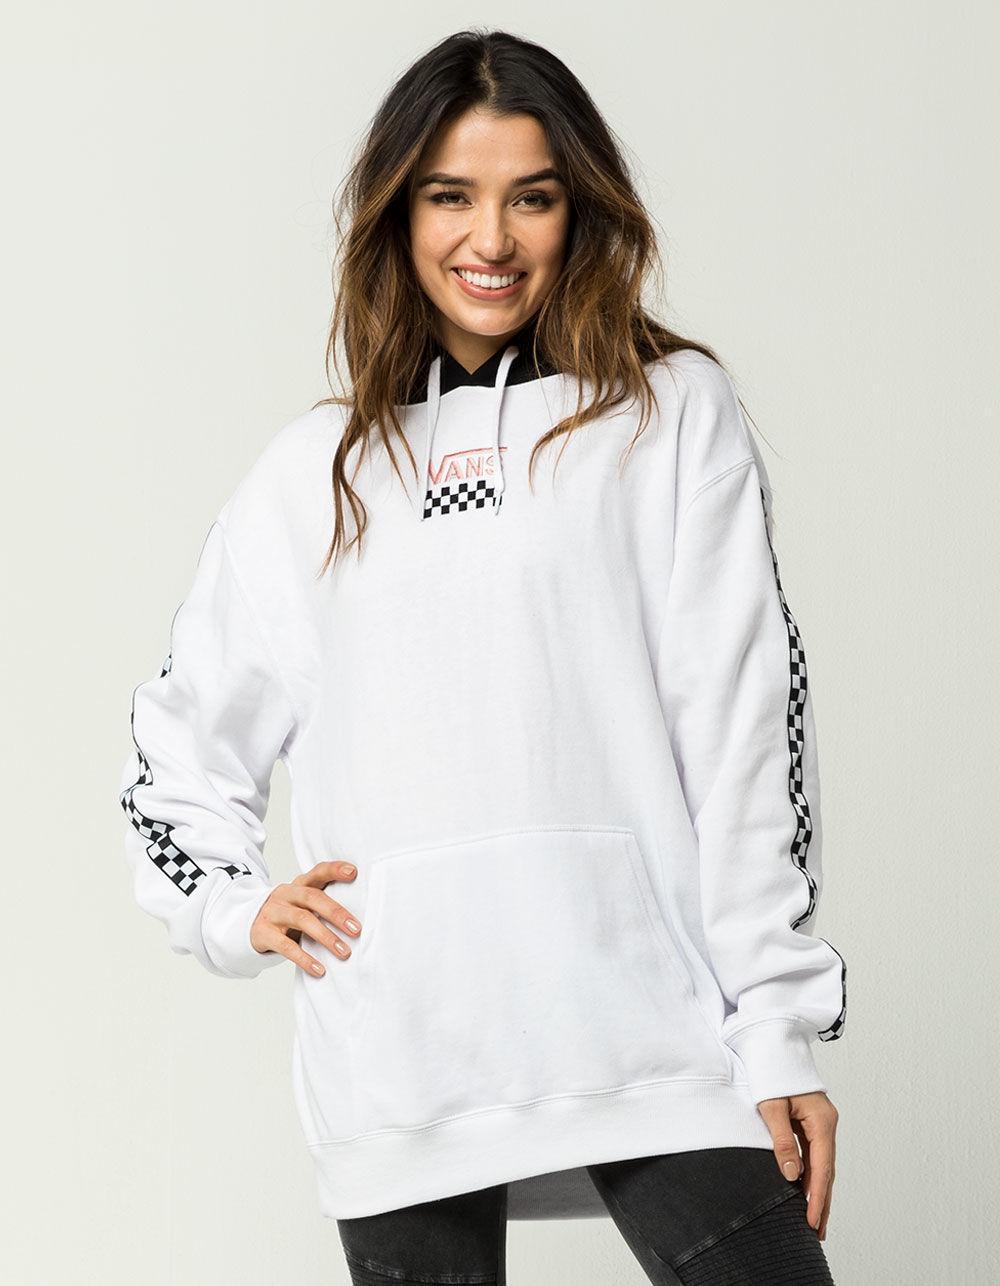 60261feacde723 Lyst - Vans Checker Womens Hoodie in White